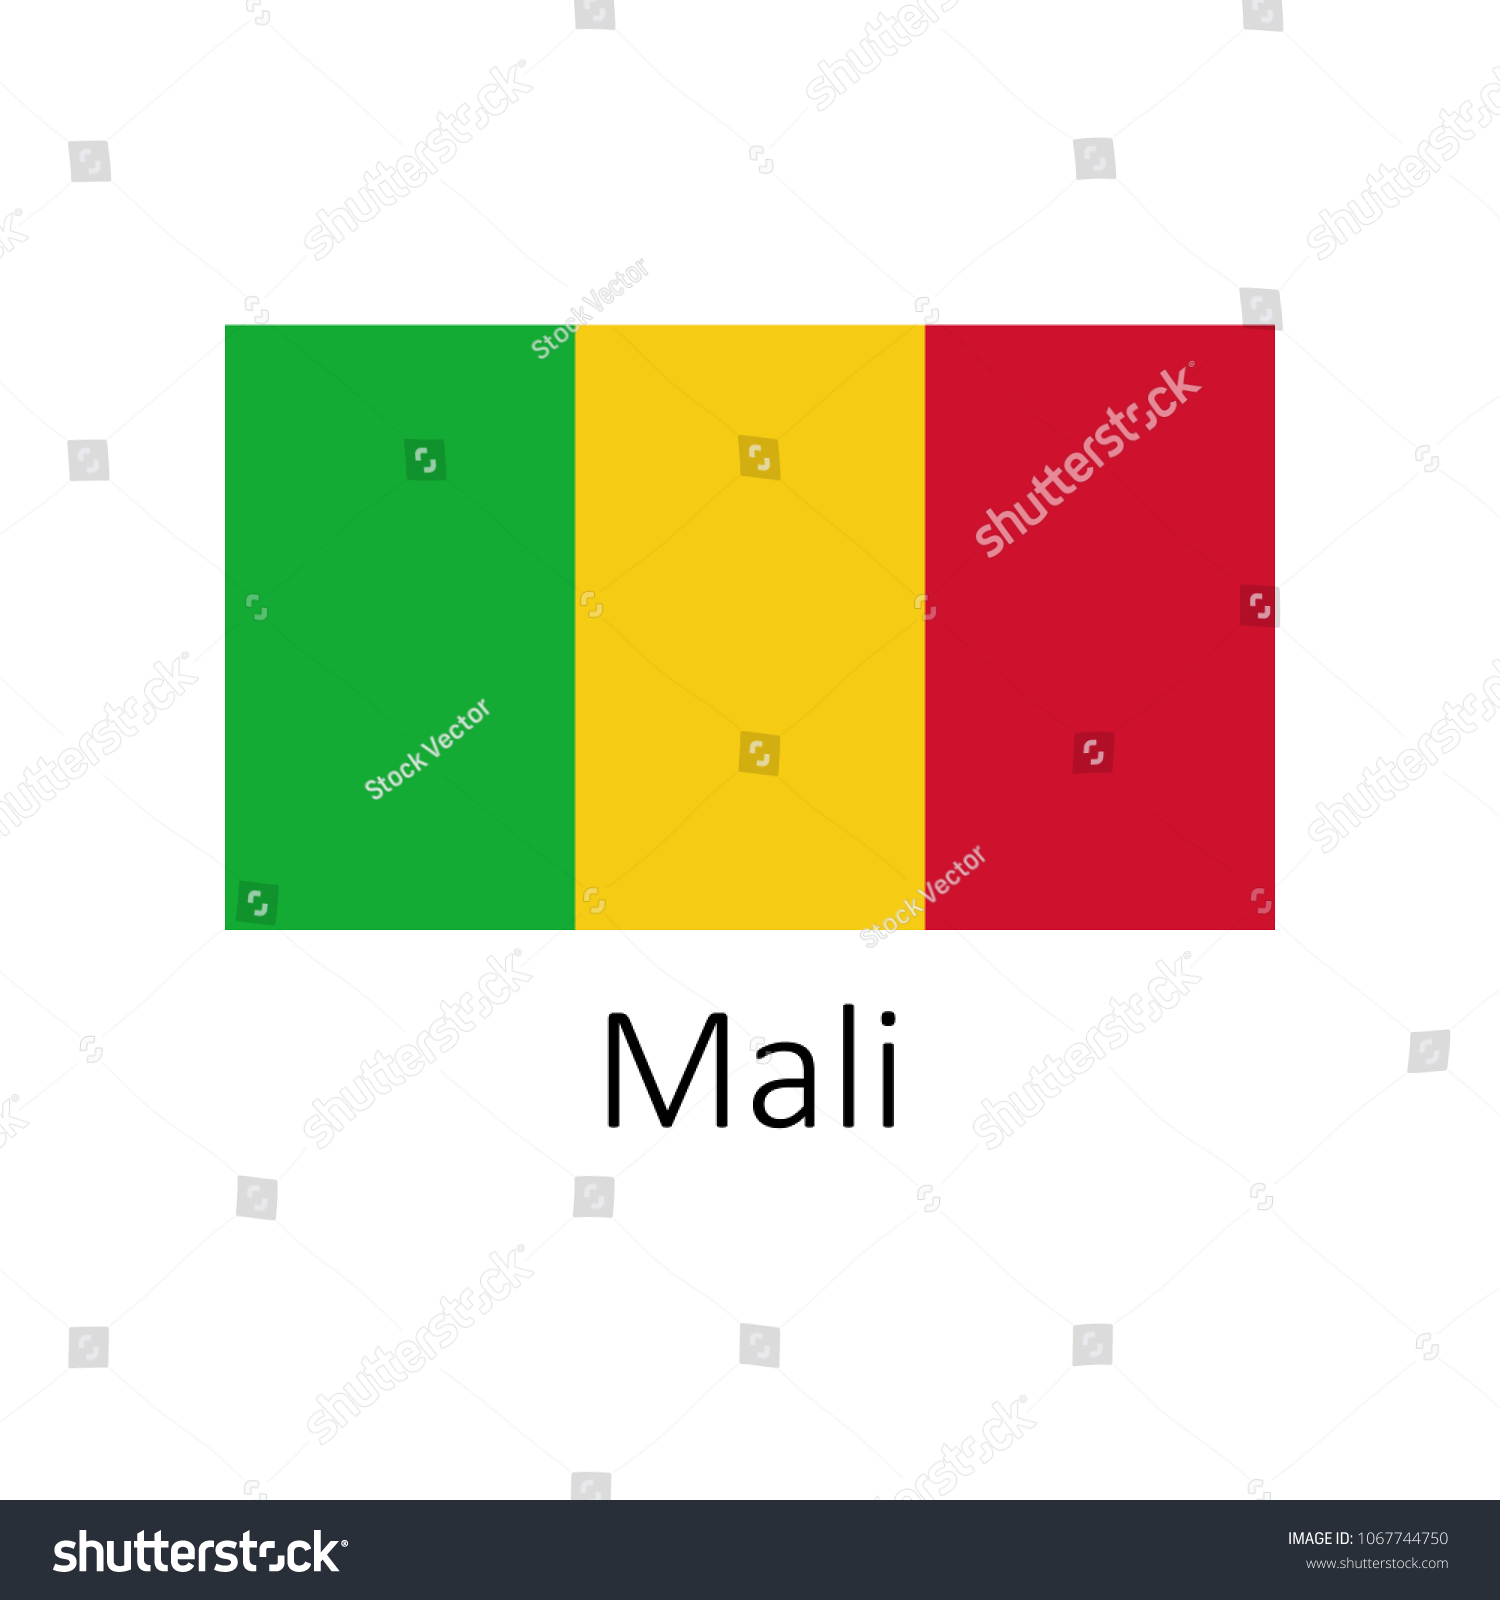 Image result for mali name